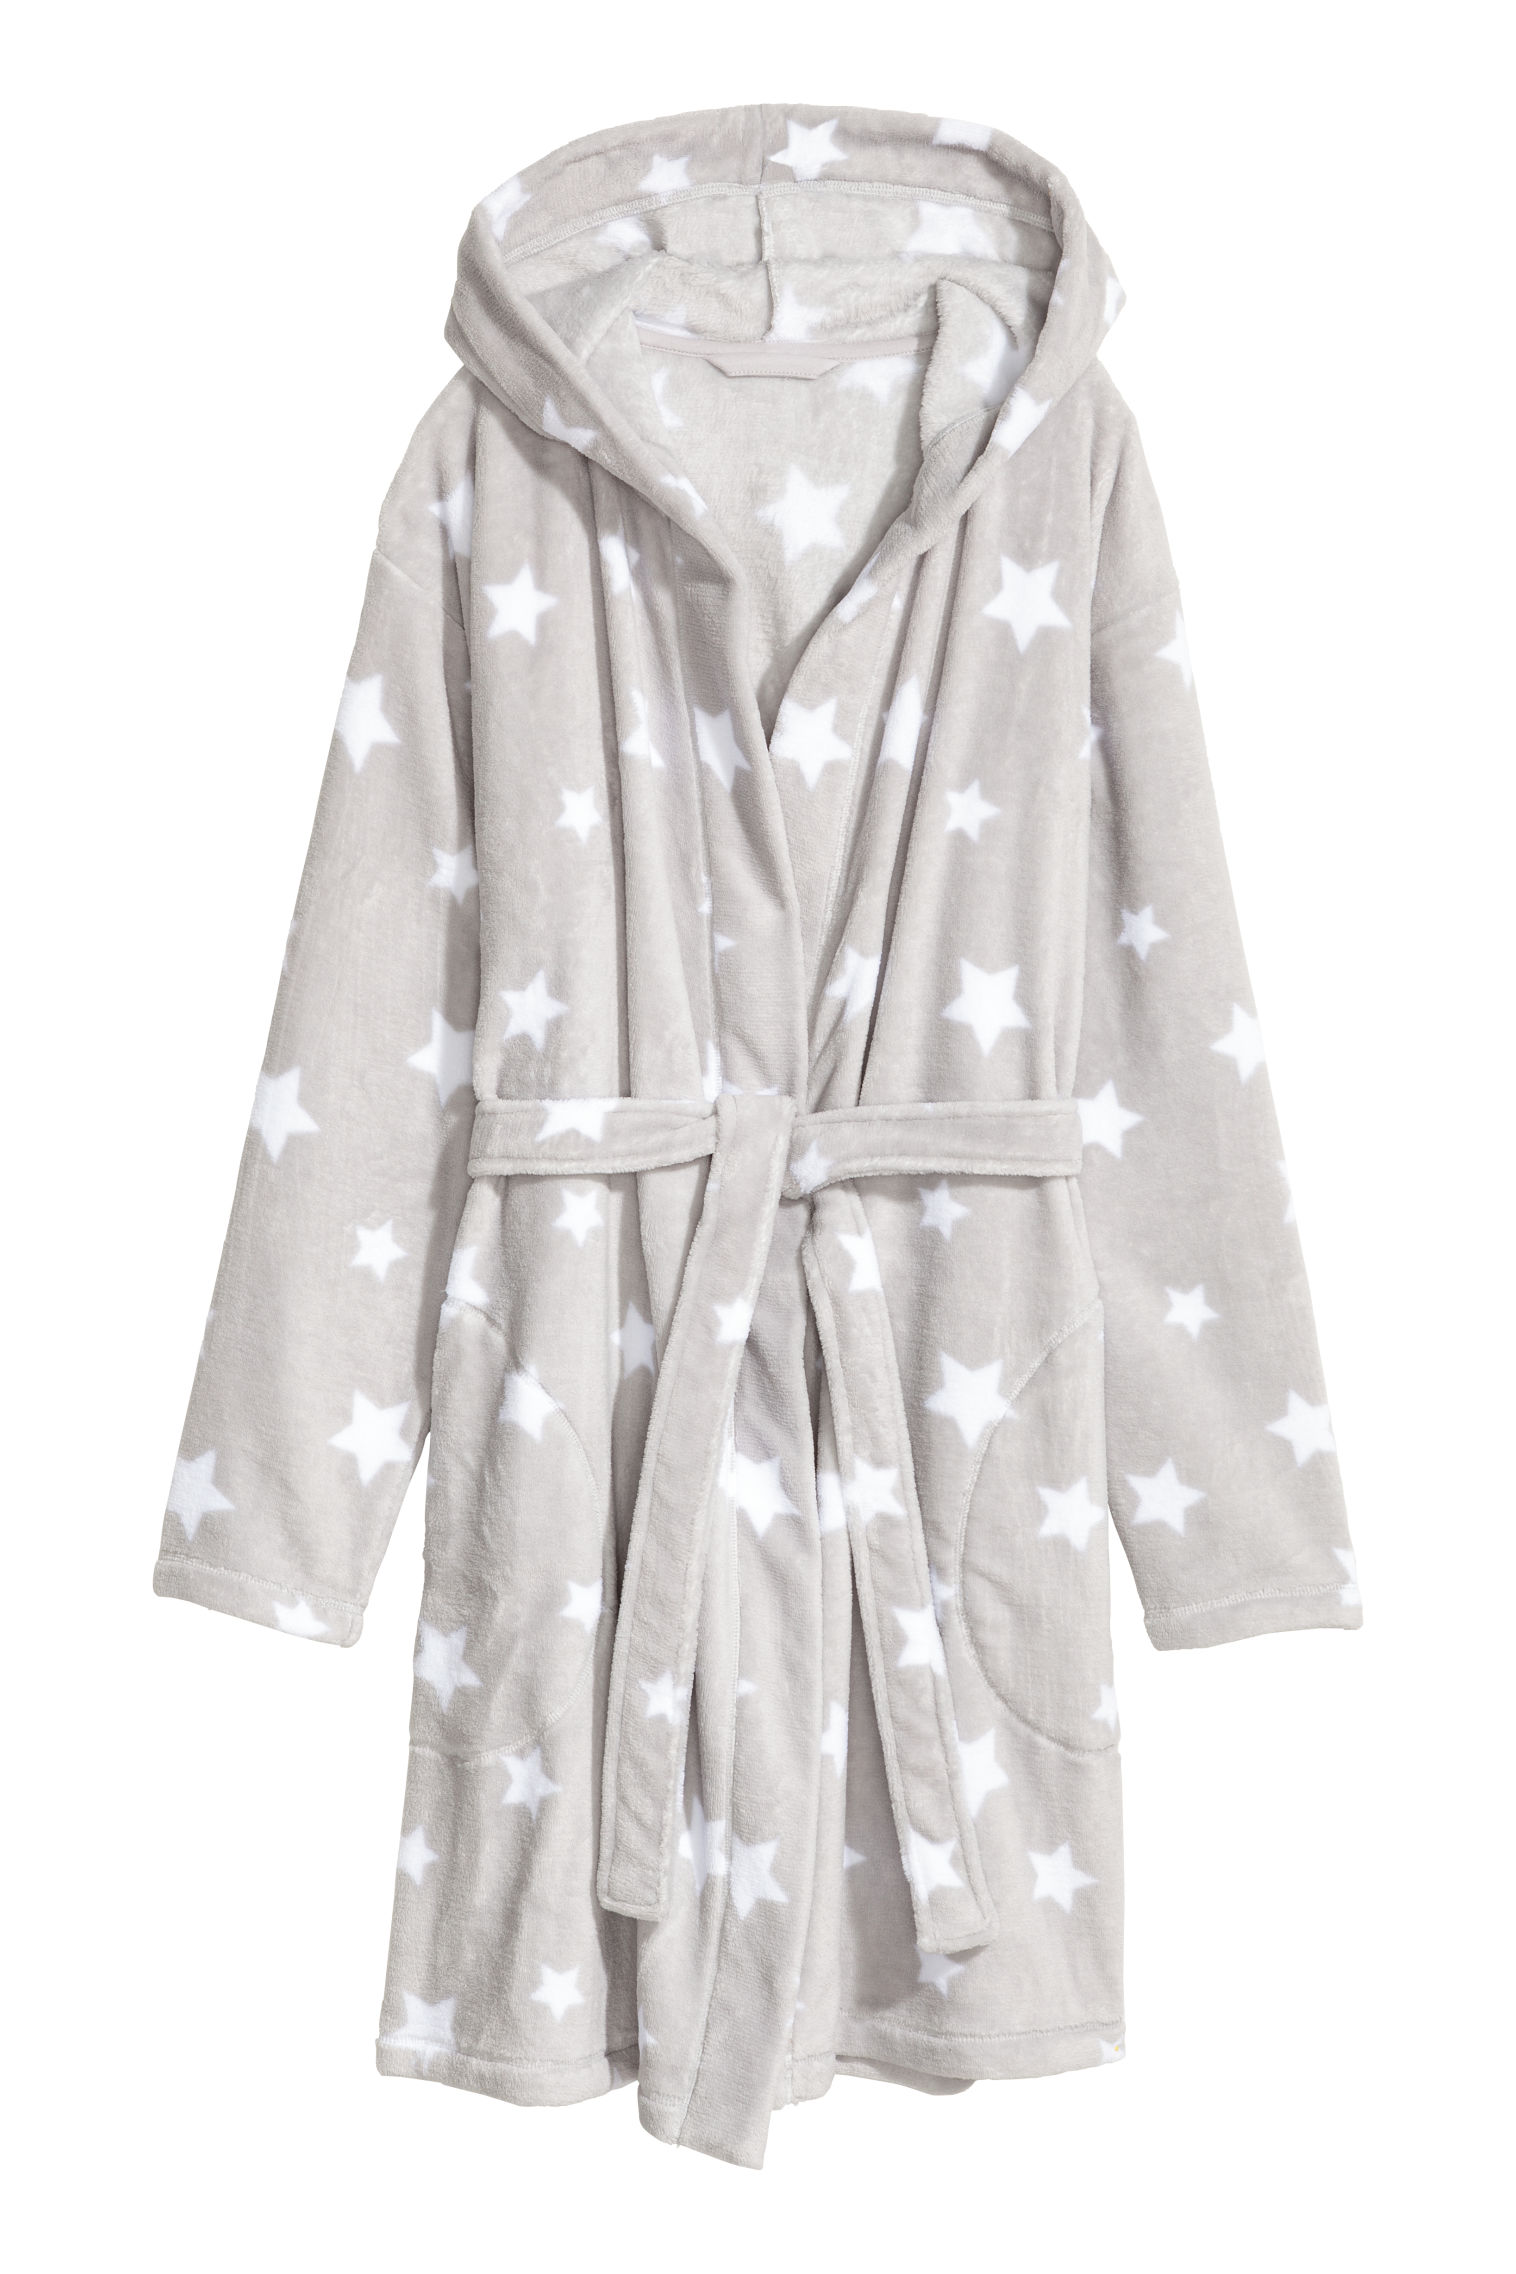 4b77f0ece1 Fleece dressing gown - Light grey Stars - Ladies